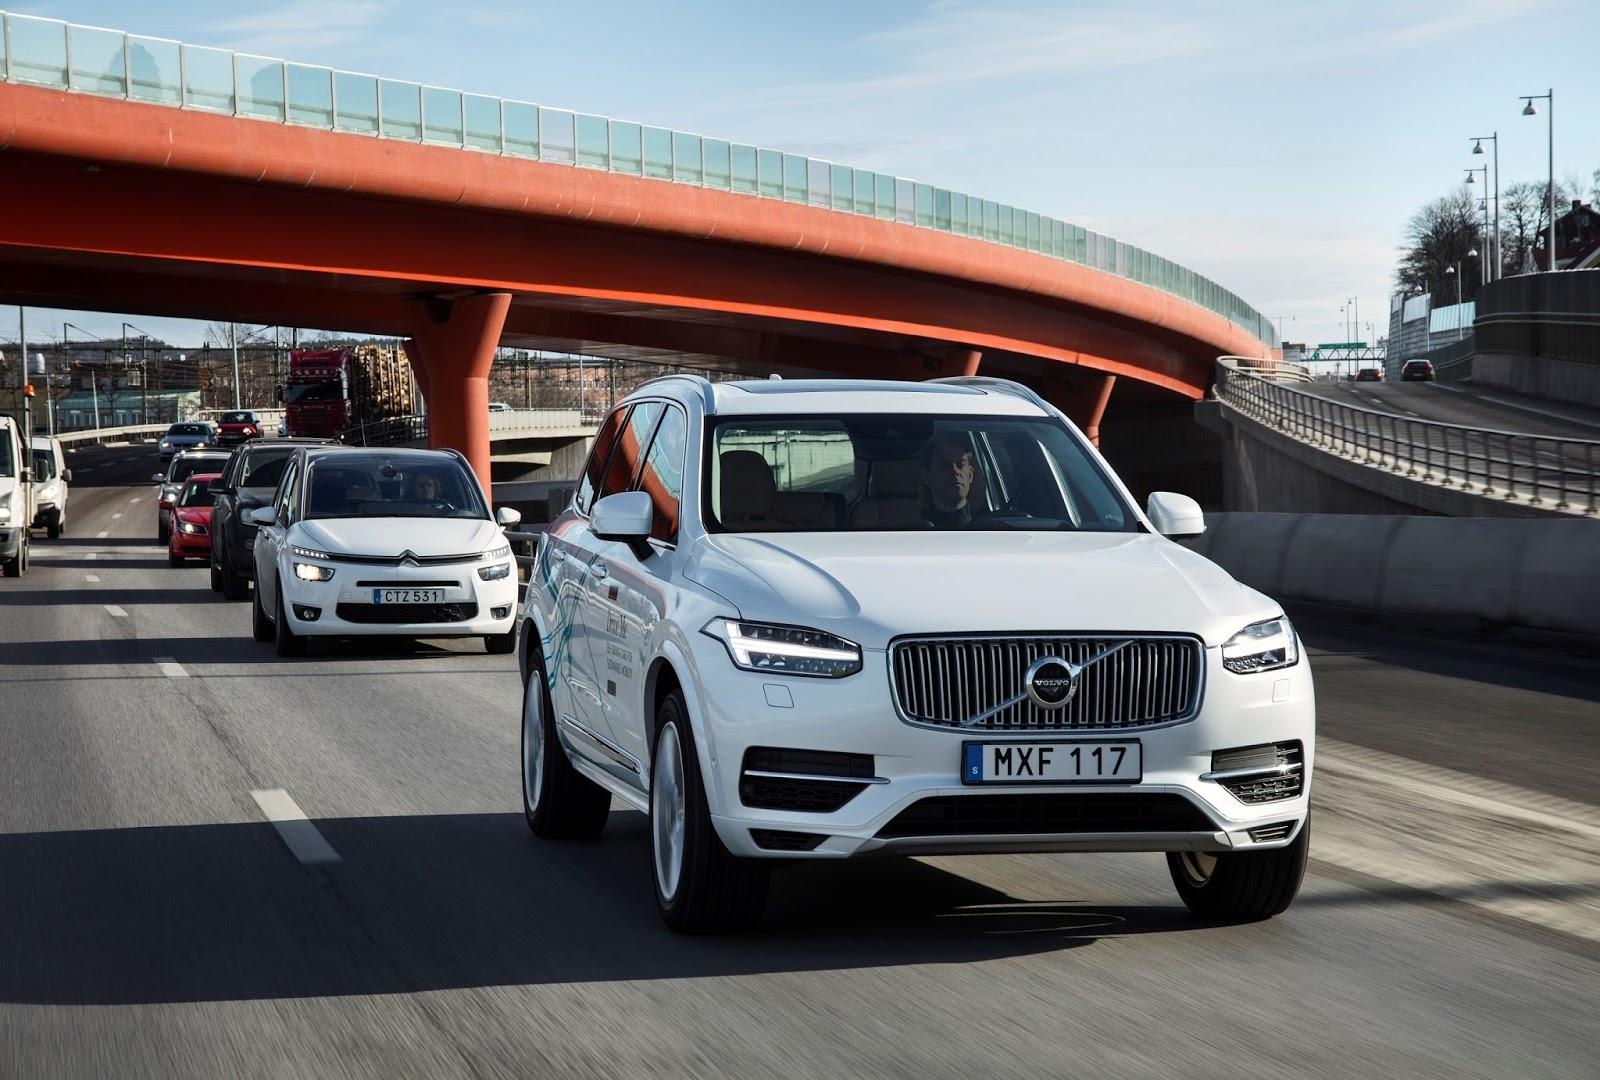 VOLVO DRIVE ME2BLONDON 1 Αυτόνομη οδήγηση από τη Volvo και στη Μεγ. Βρετανία Autonomous Driving, videos, Volvo, Volvo Cars, Τεχνολογία